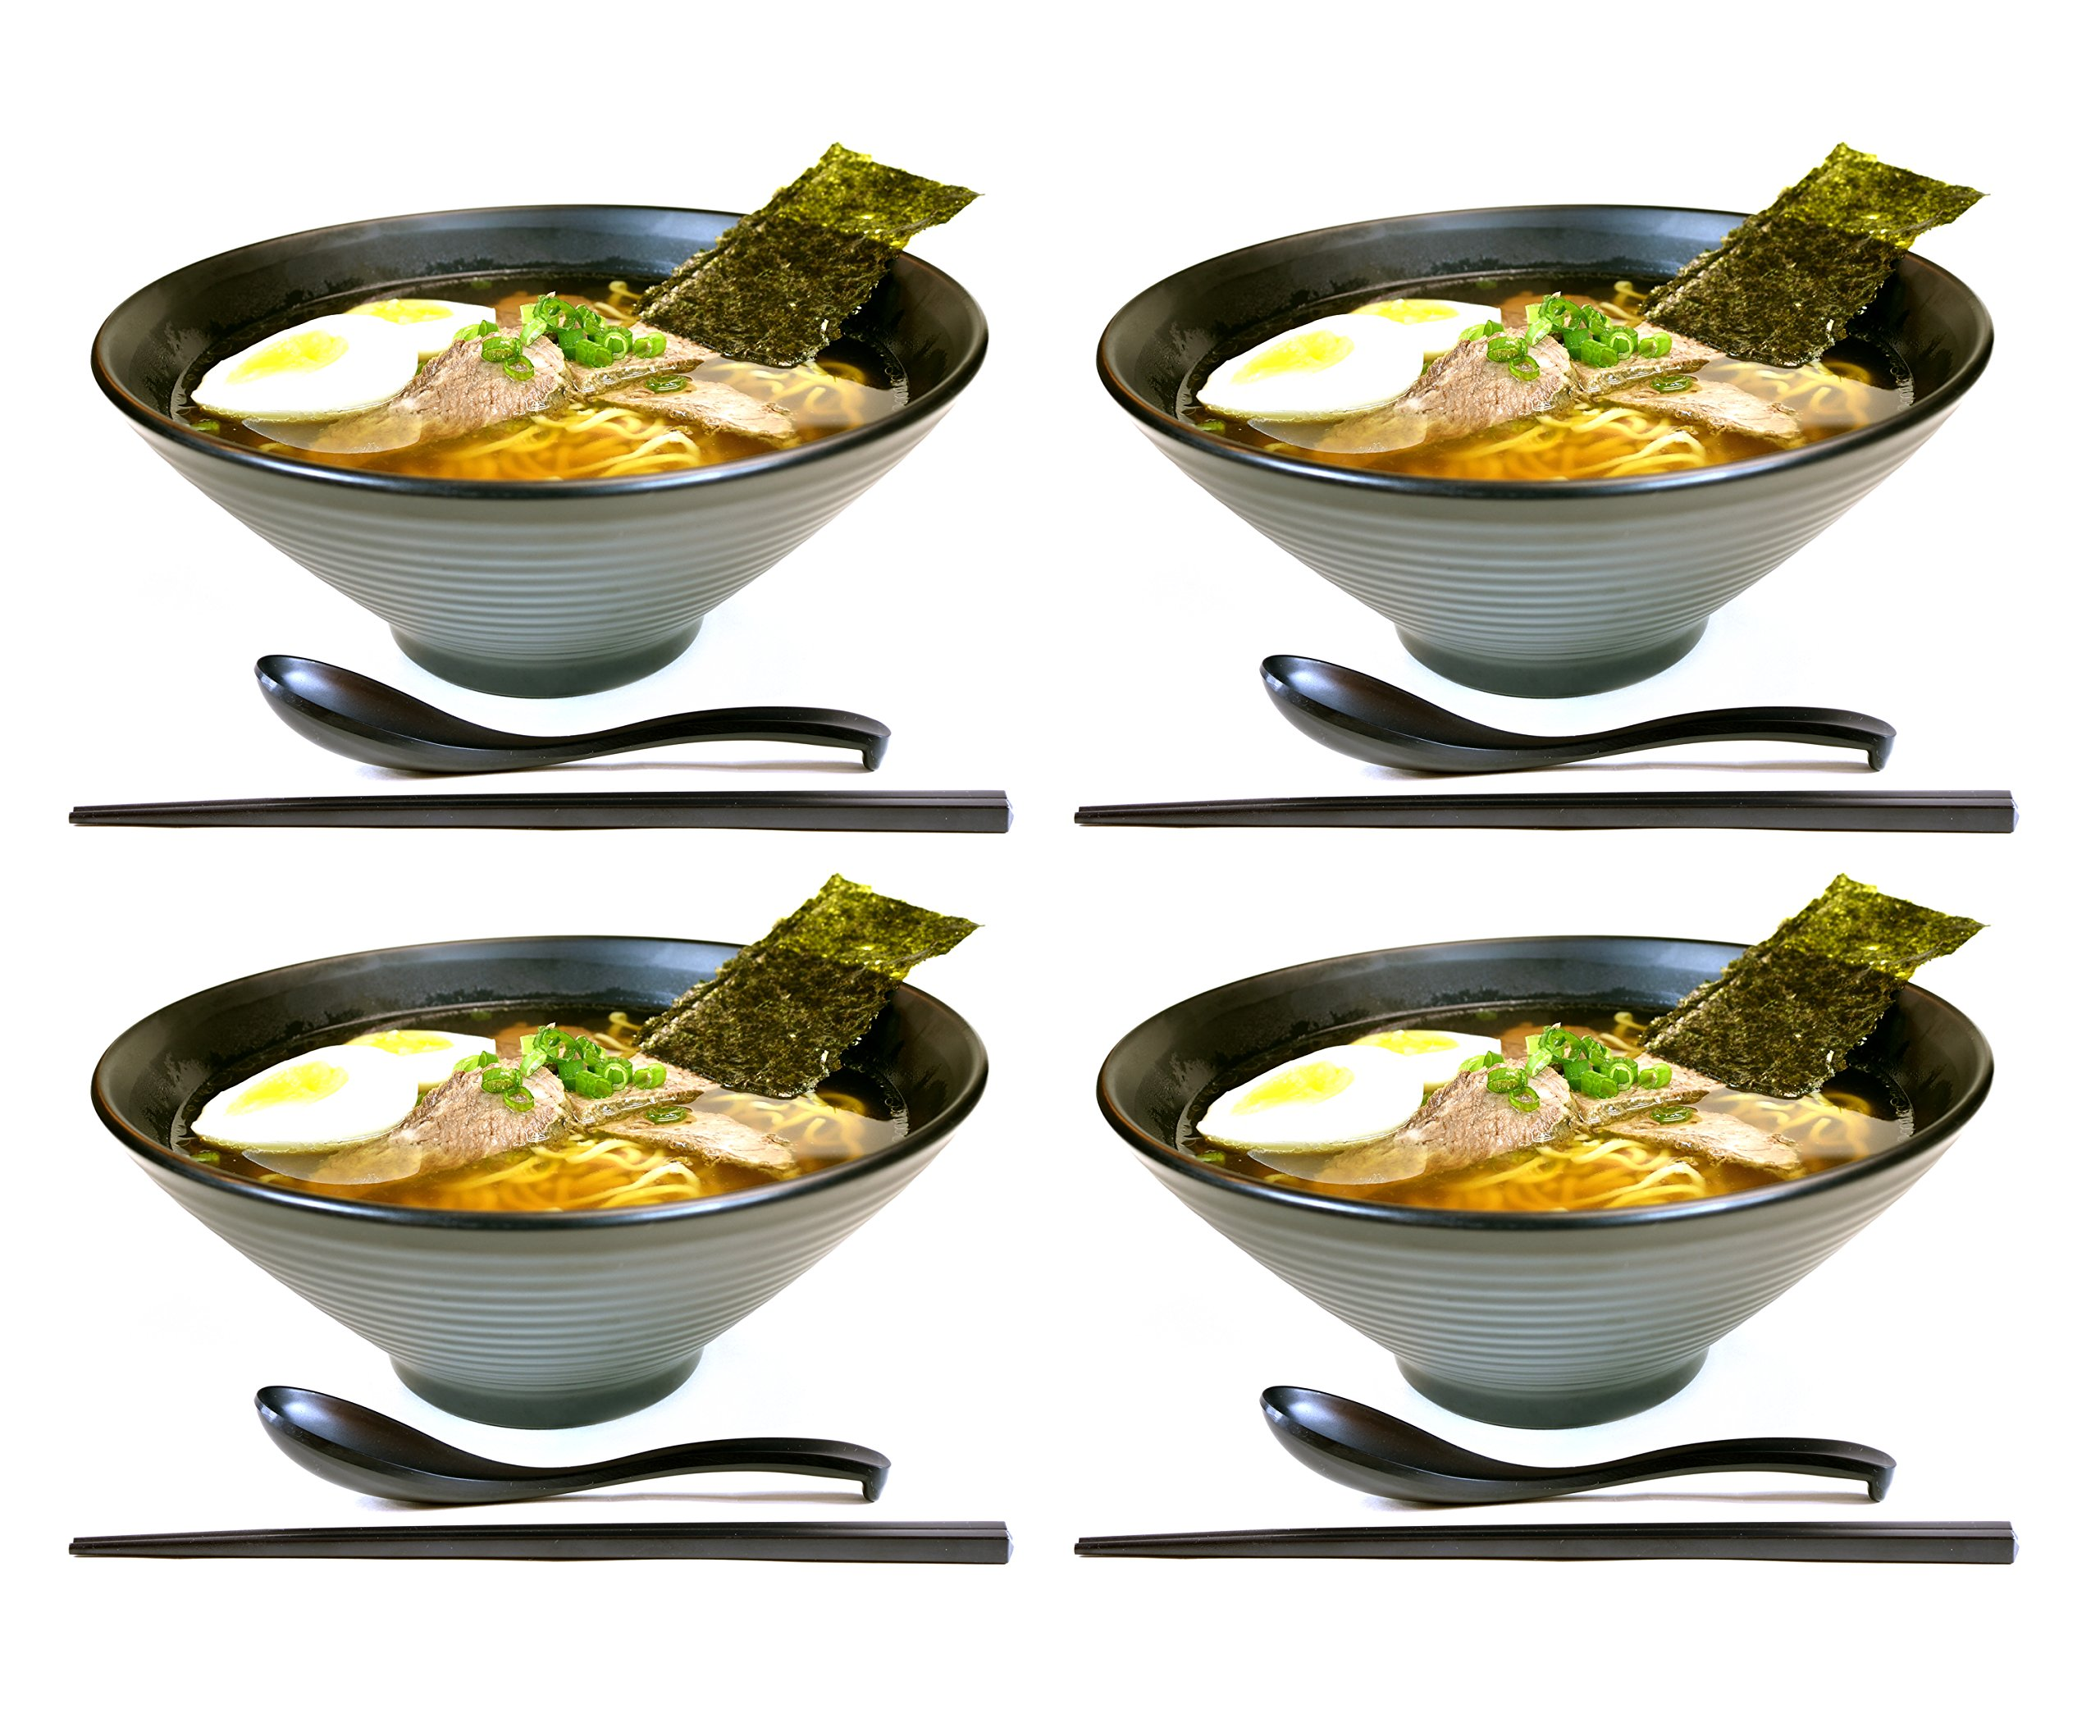 4 sets (12 piece) Large Japanese Ramen Noodle Soup Bowl Melamine Hard Plastic Dishware Set with Matching Spoon and Chopsticks for Udon Soba Pho Asian Noodles (4, Black) by APEX S.K.